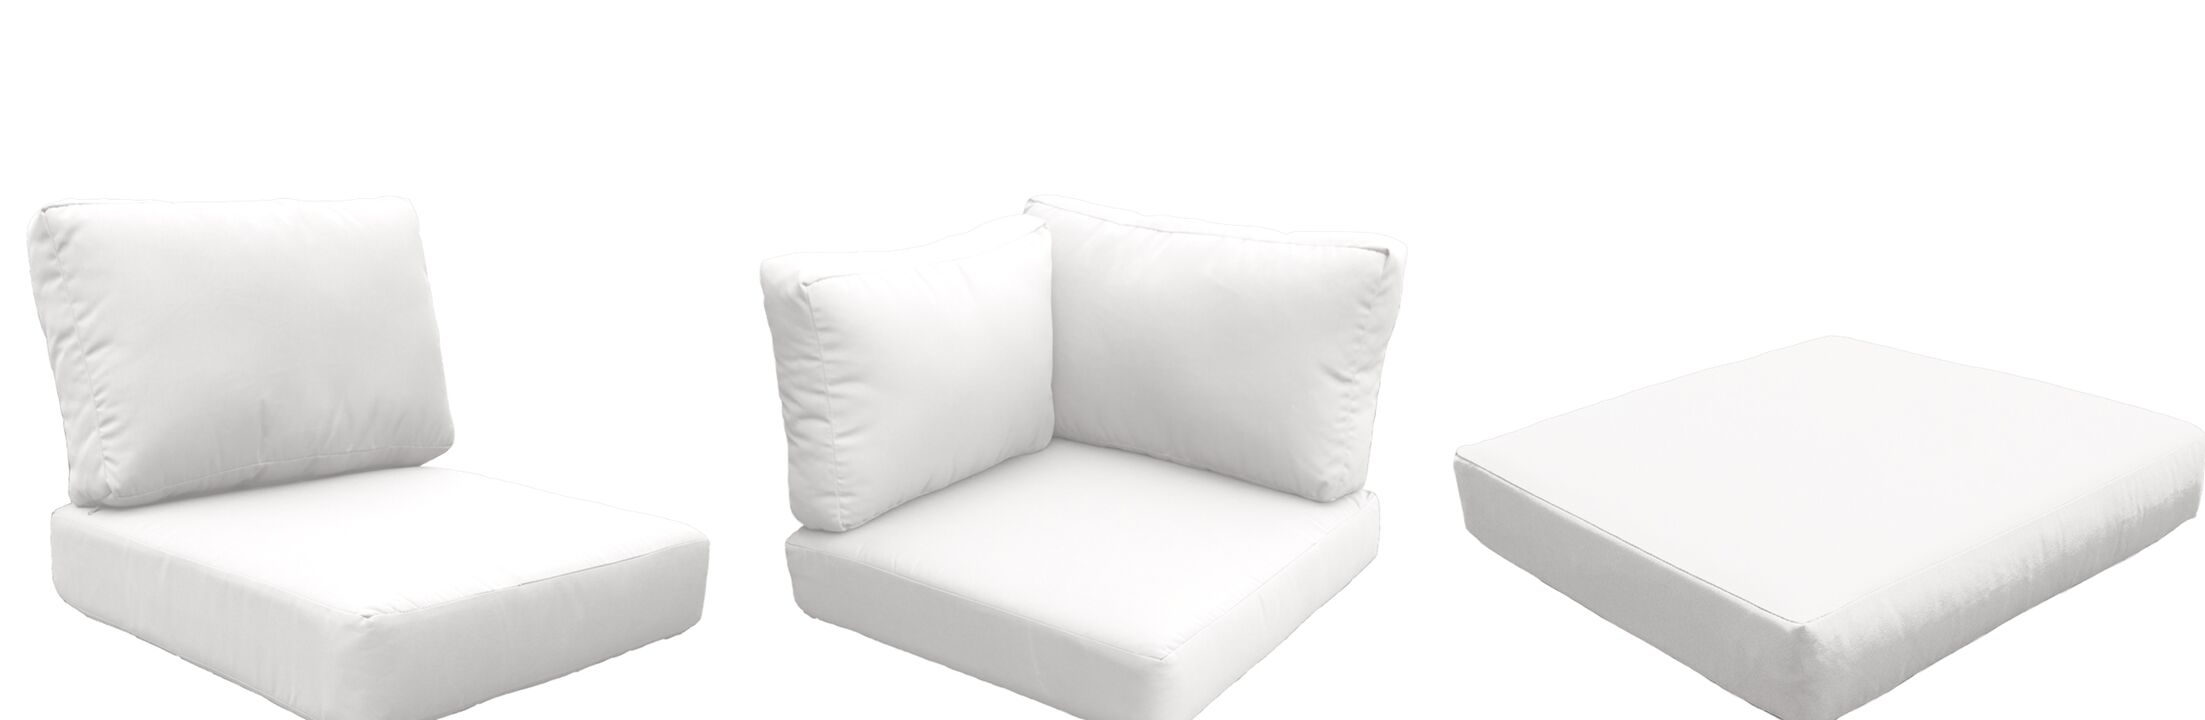 Fairmont Outdoor 20 Piece Lounge Chair Cushion Set Fabric: White